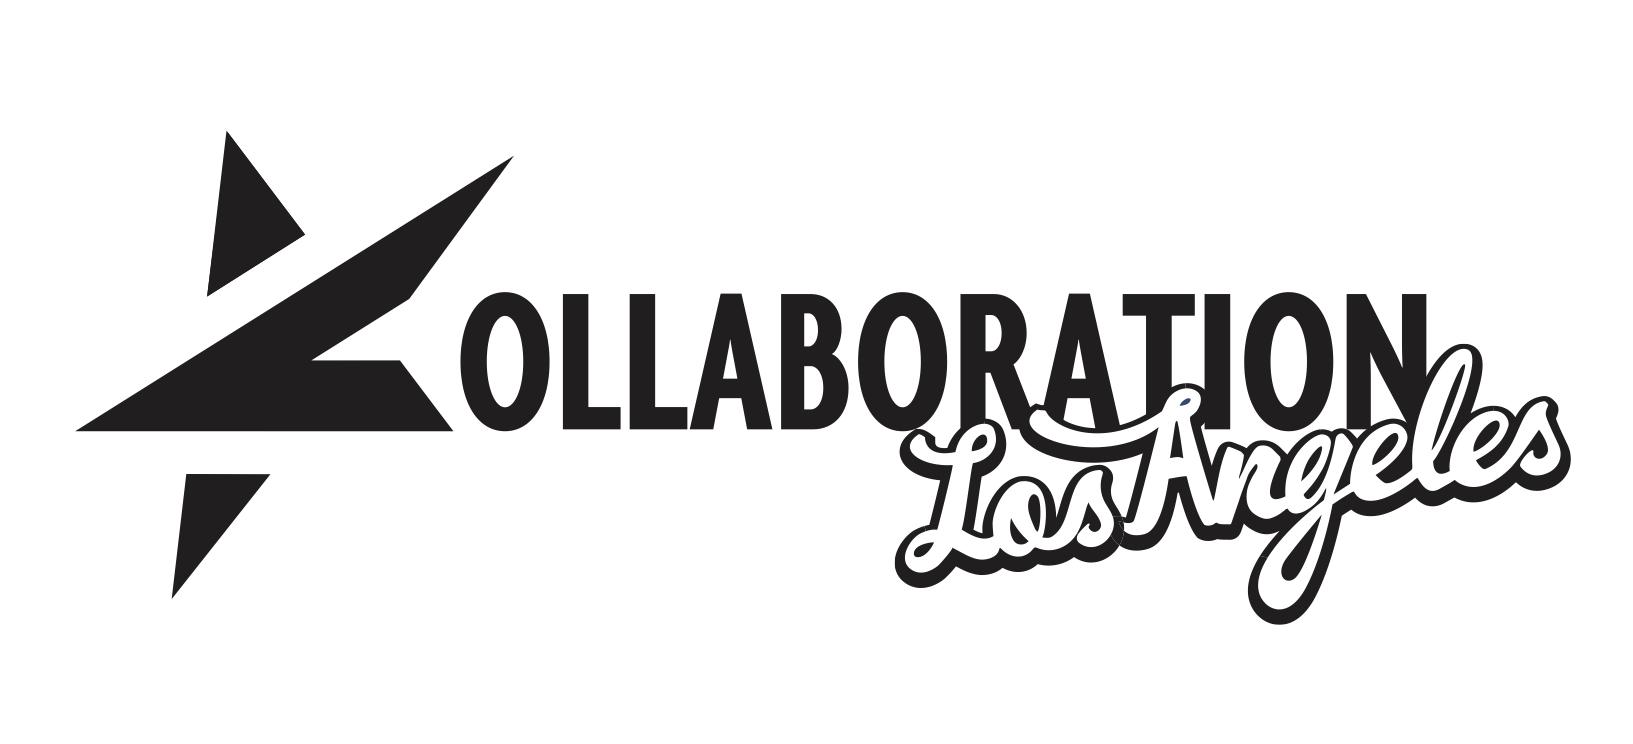 Kollab LA logo.jpg